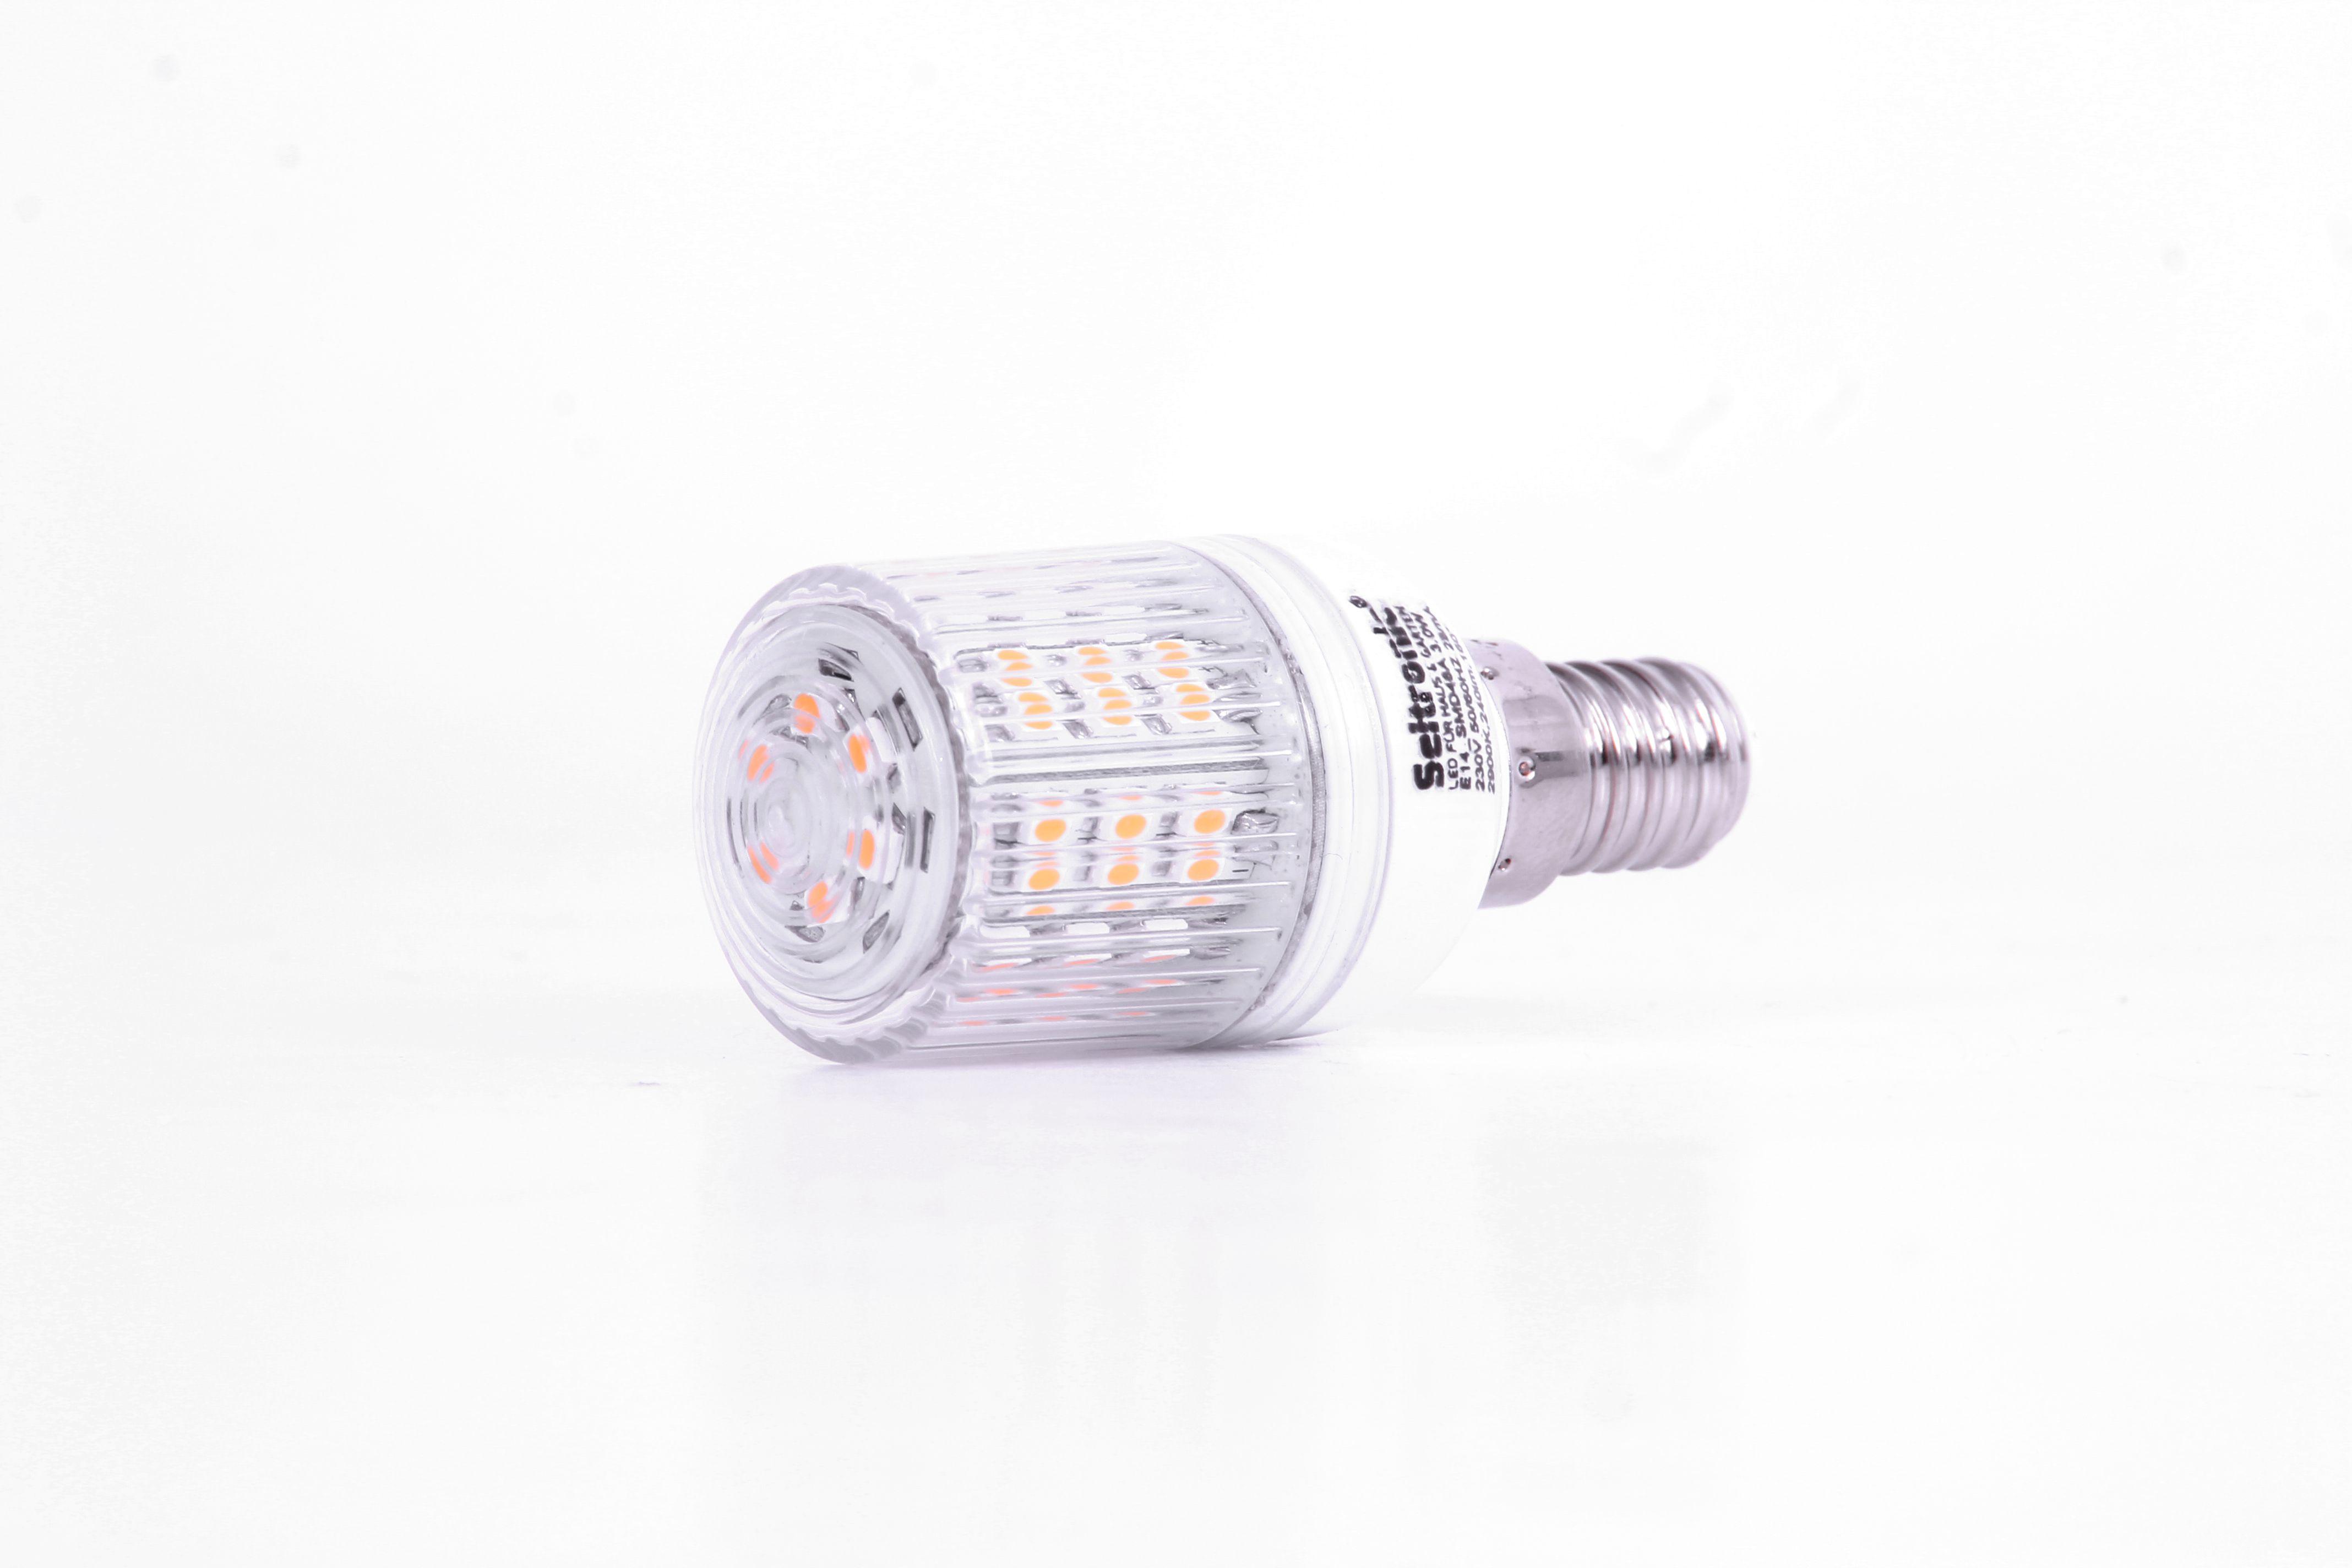 e14_led_lampe_von_seitronic Luxus Led Lampe 3 Watt Dekorationen